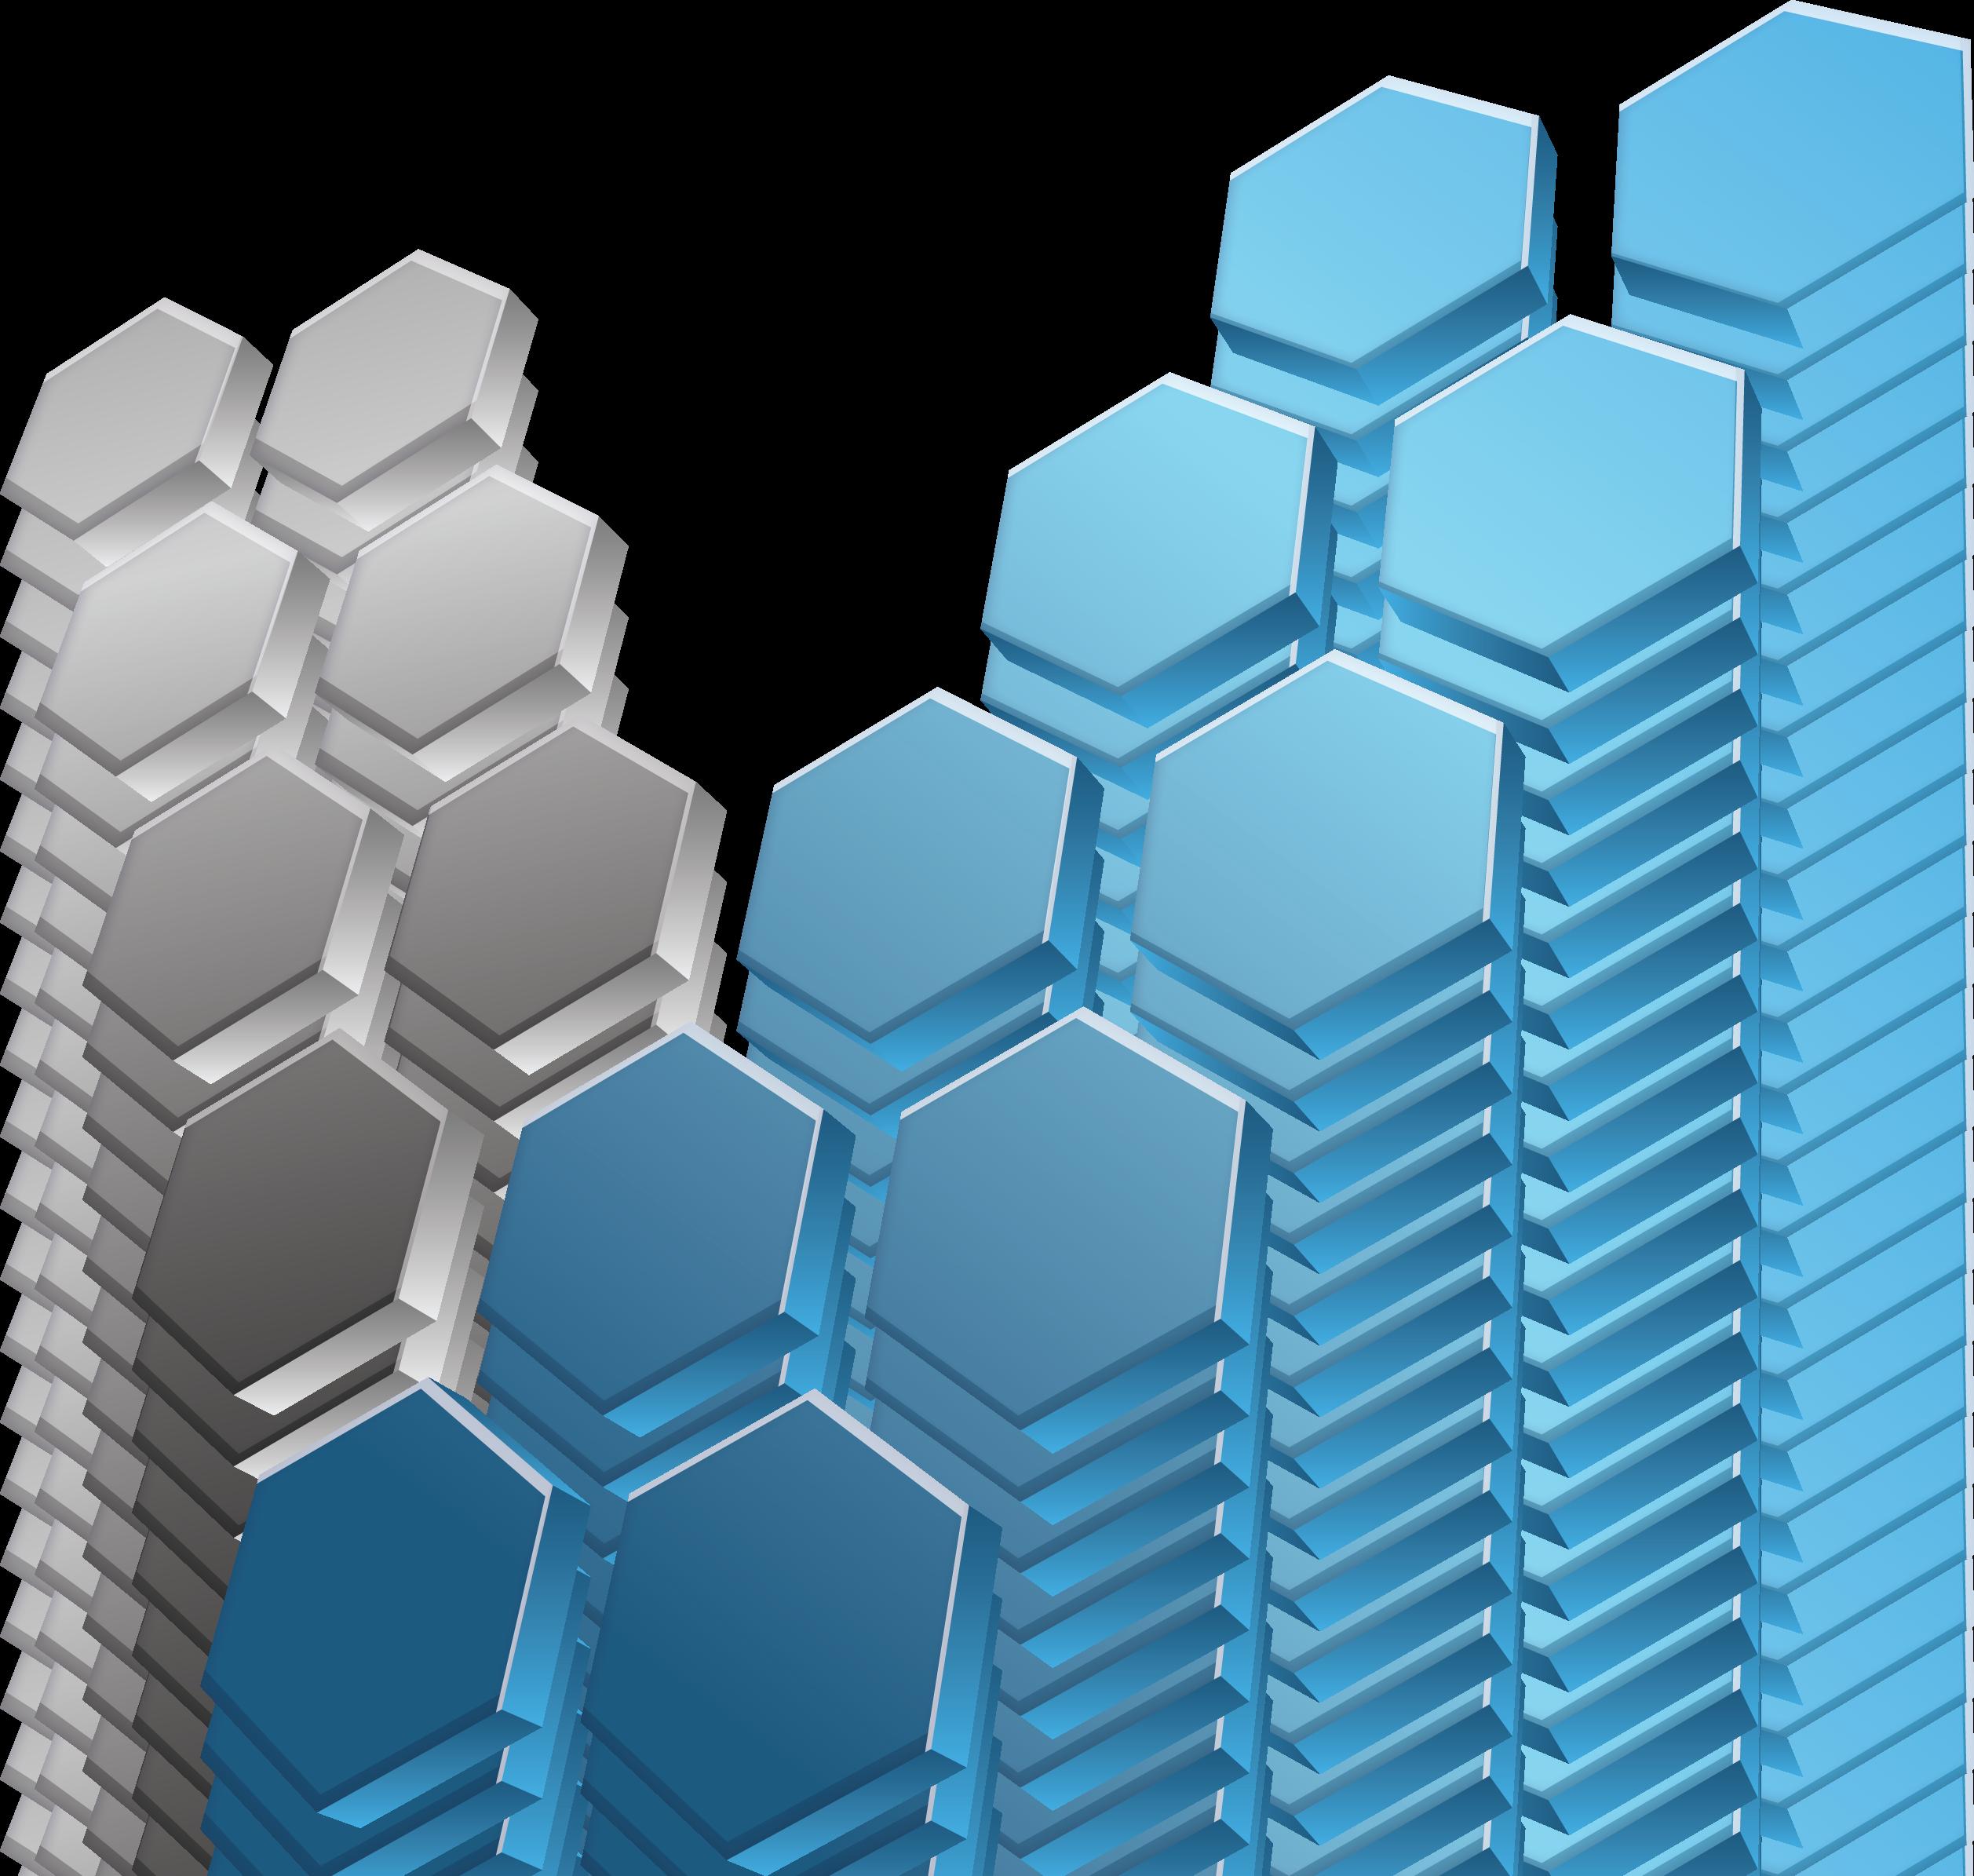 Standard logo image only